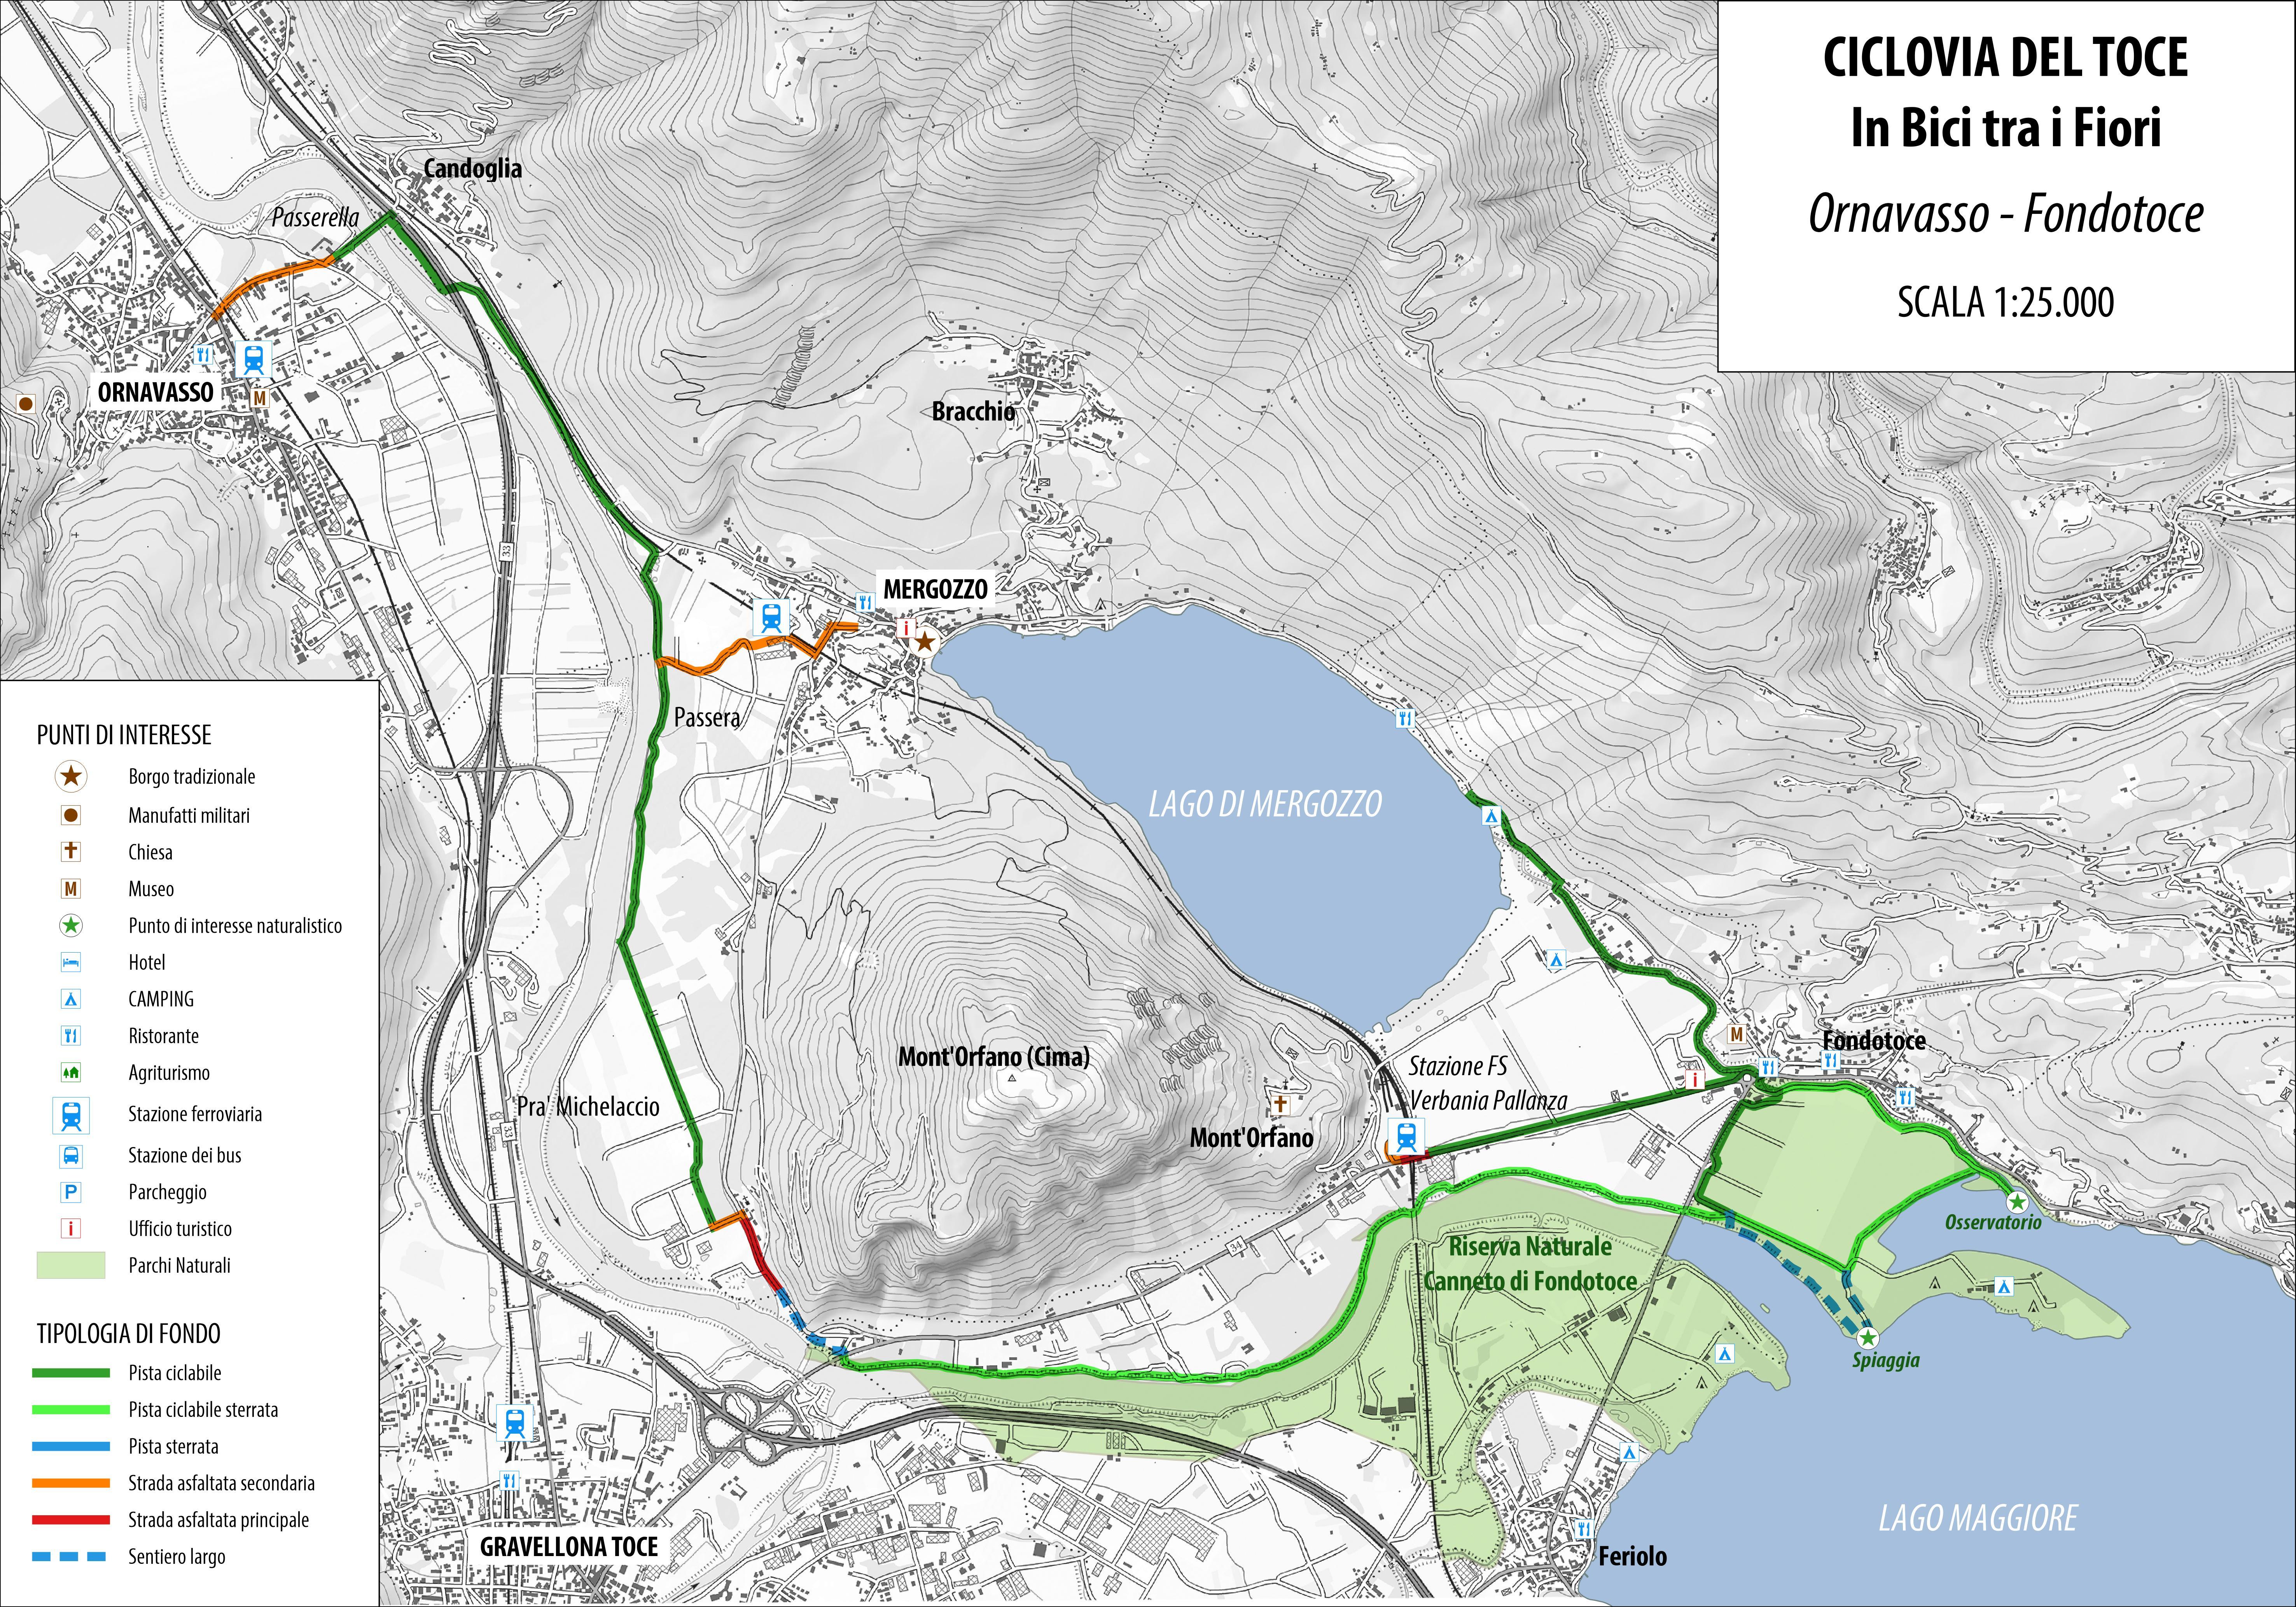 Cartina Lago Maggiore Stradale.A Bike N 4 Ciclovia Del Toce In Bici Tra I Fiori Distrettolaghi It